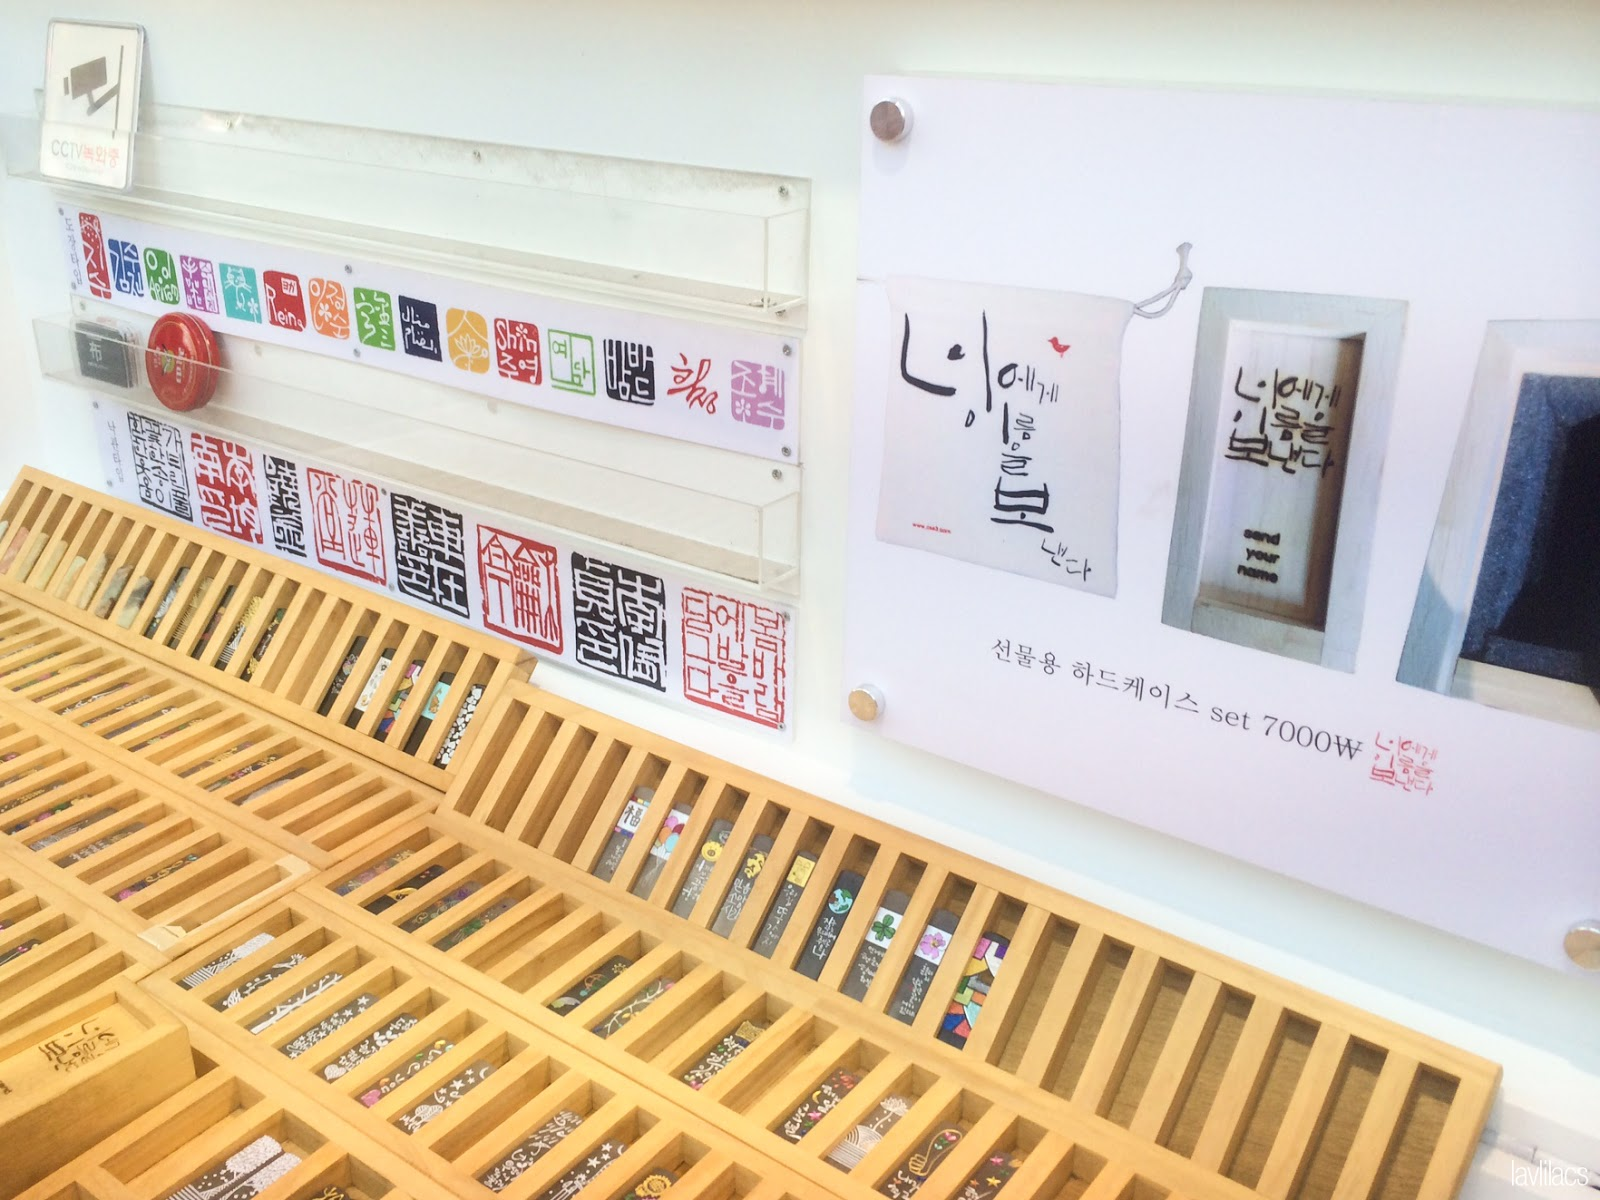 Seoul, Korea - Summer Study Abroad 2014 - Seoul City Touring - Insadong 인사동 仁寺洞 - Stamps seal